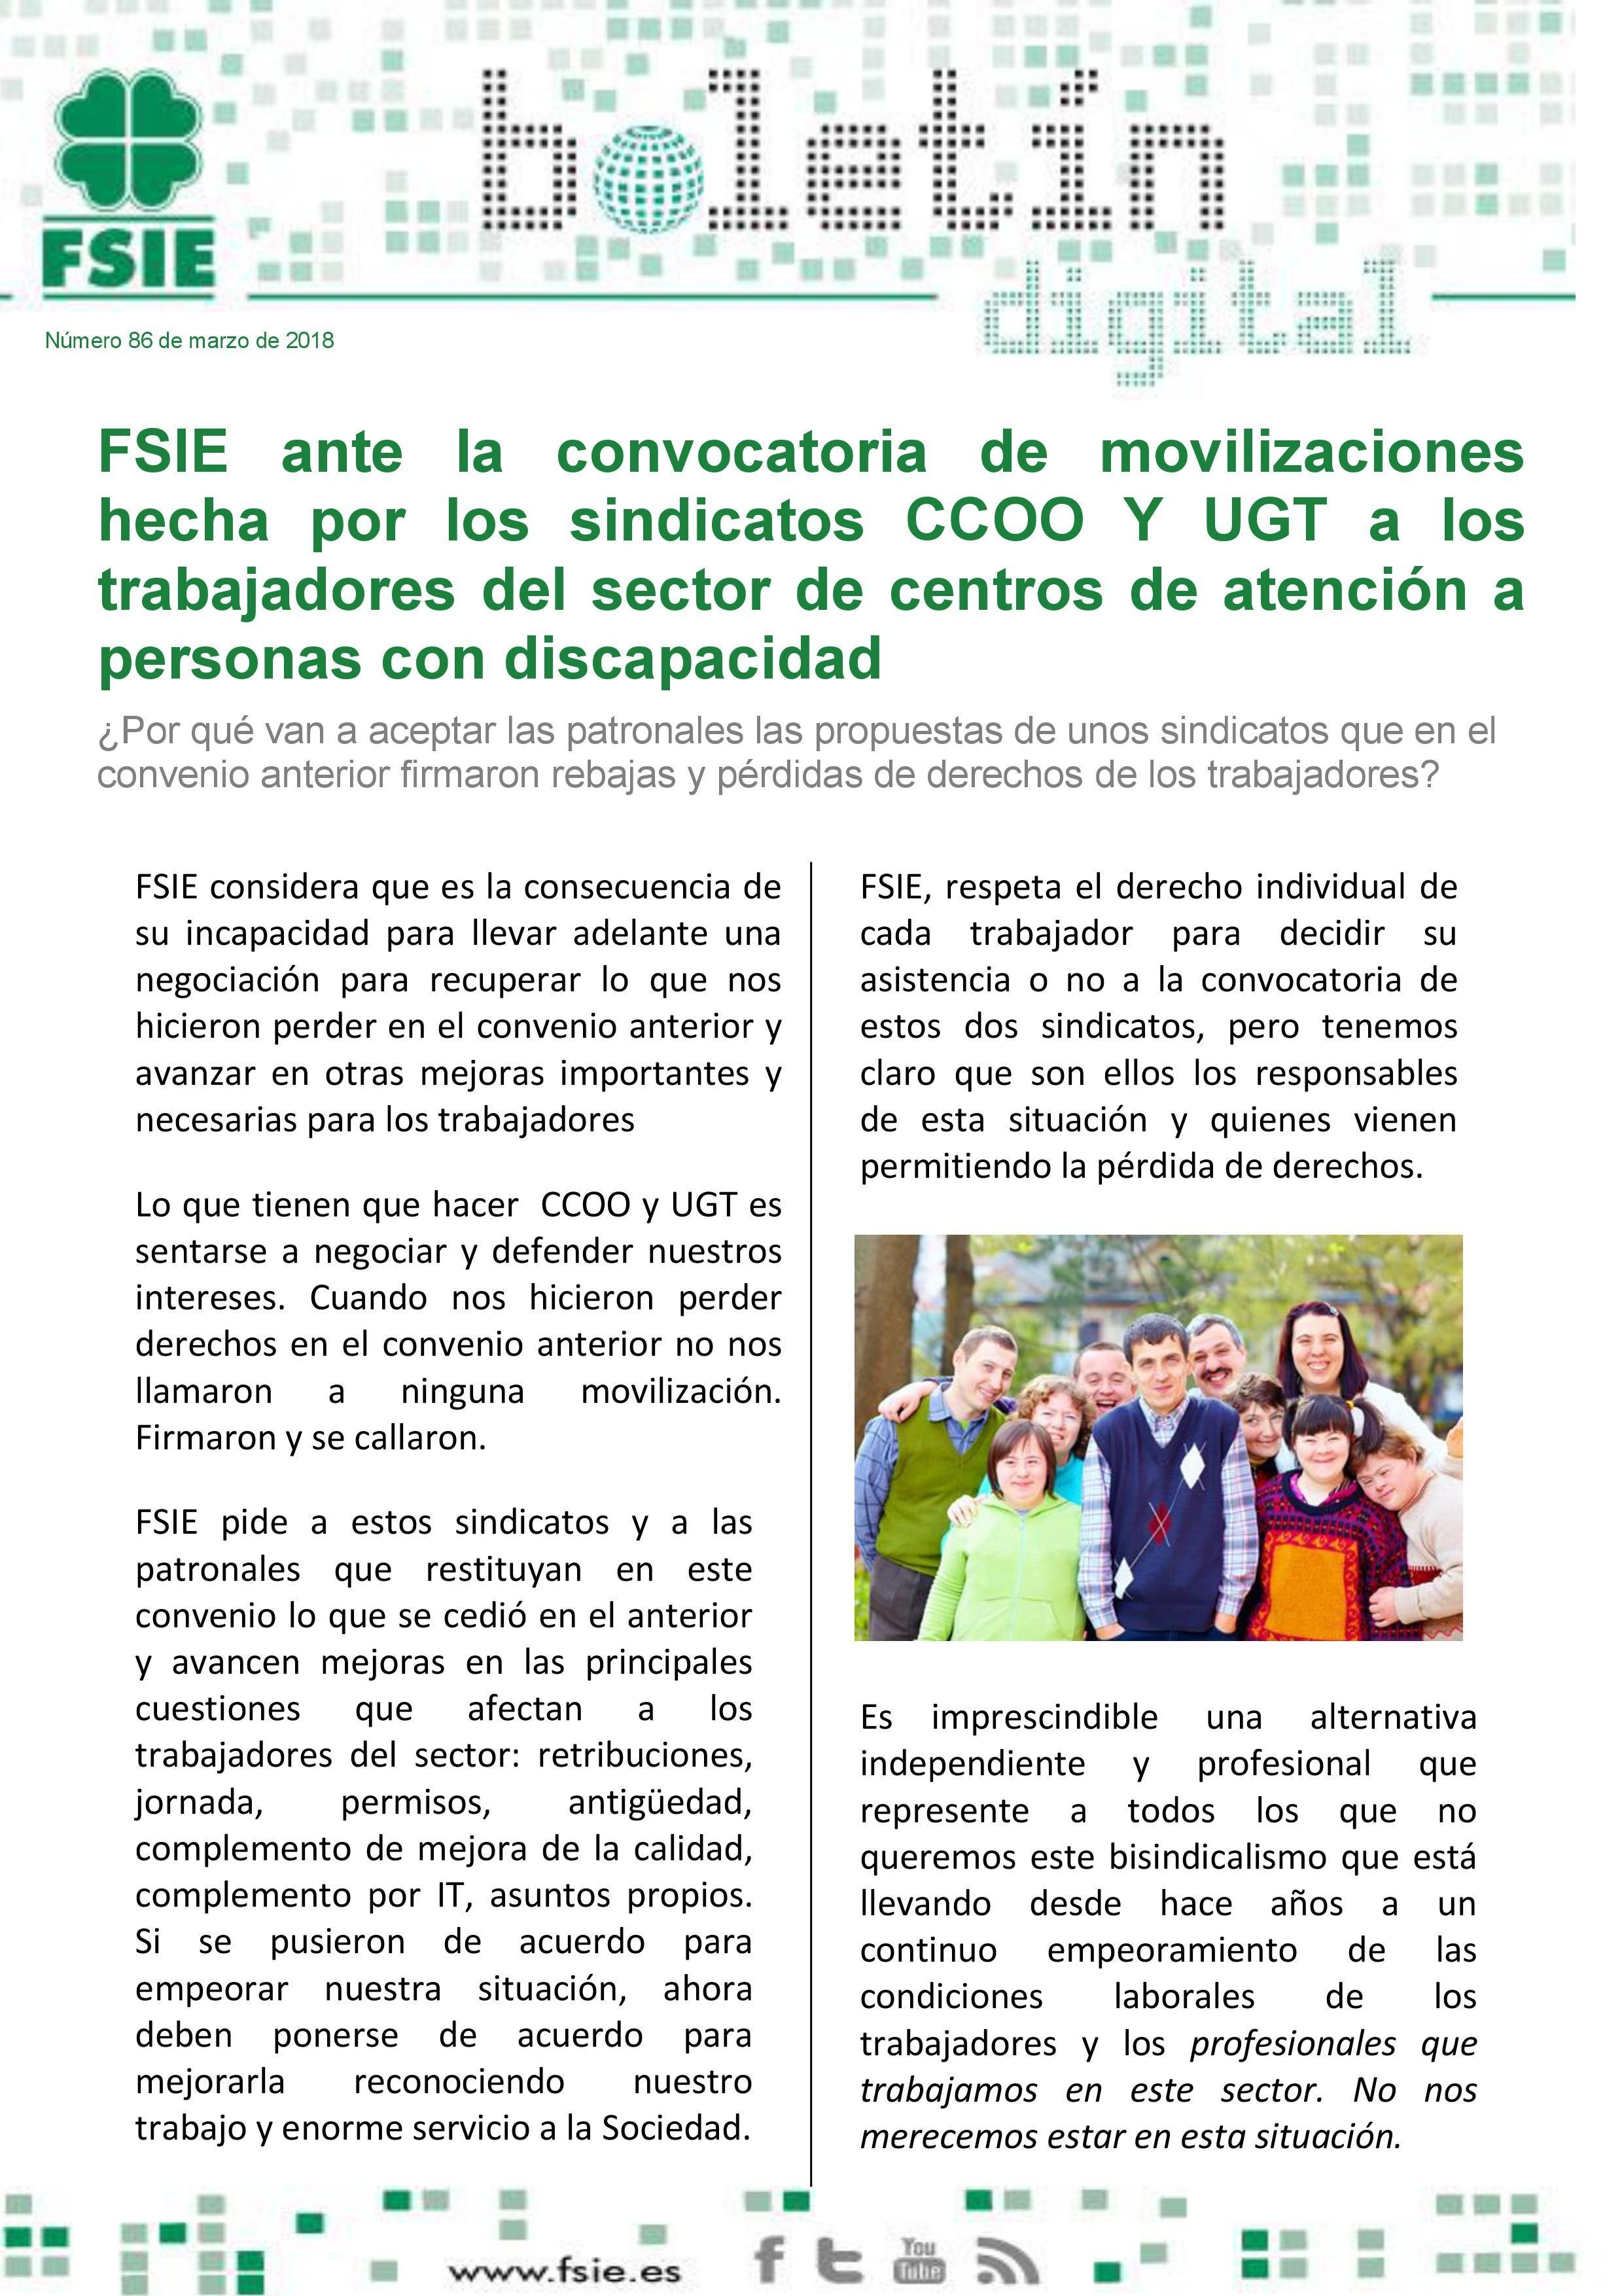 Calendario Escolar 2019 Mexico Para Imprimir Más Recientes Verificar Calendario Escolar 2019 Y 2019 Para Imprimir